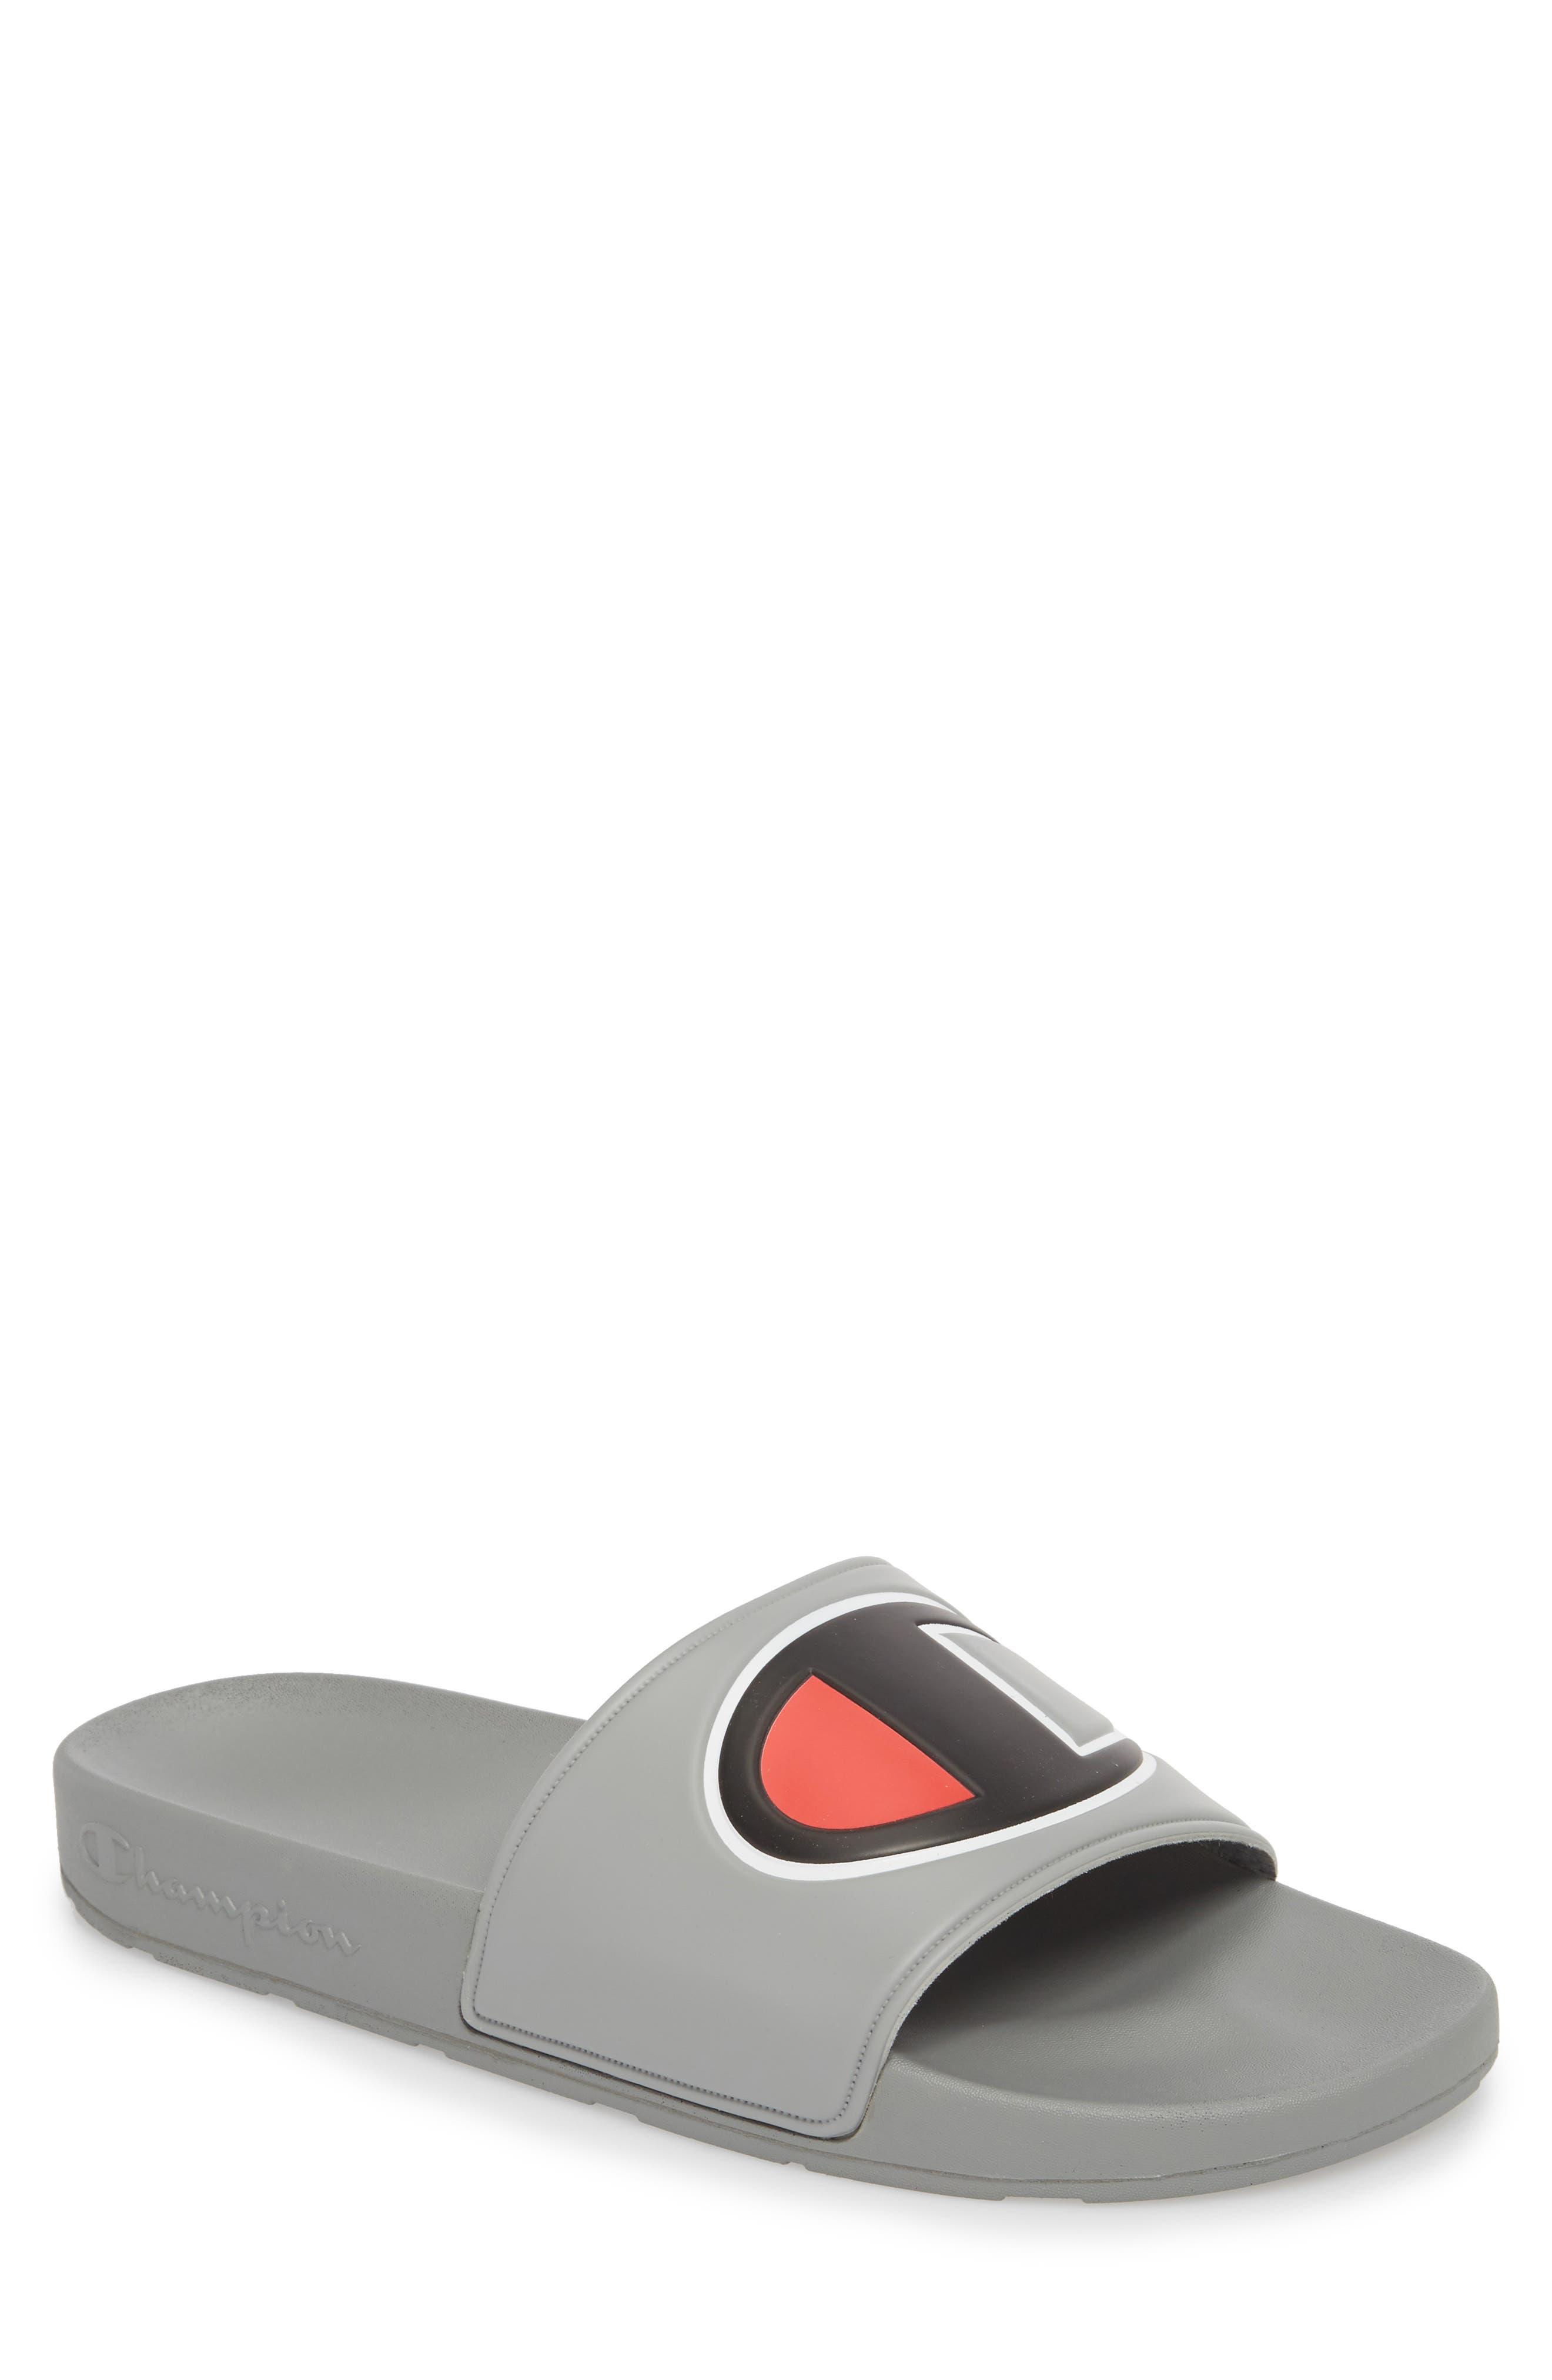 IPO Sports Slide Sandal,                             Main thumbnail 1, color,                             GREY